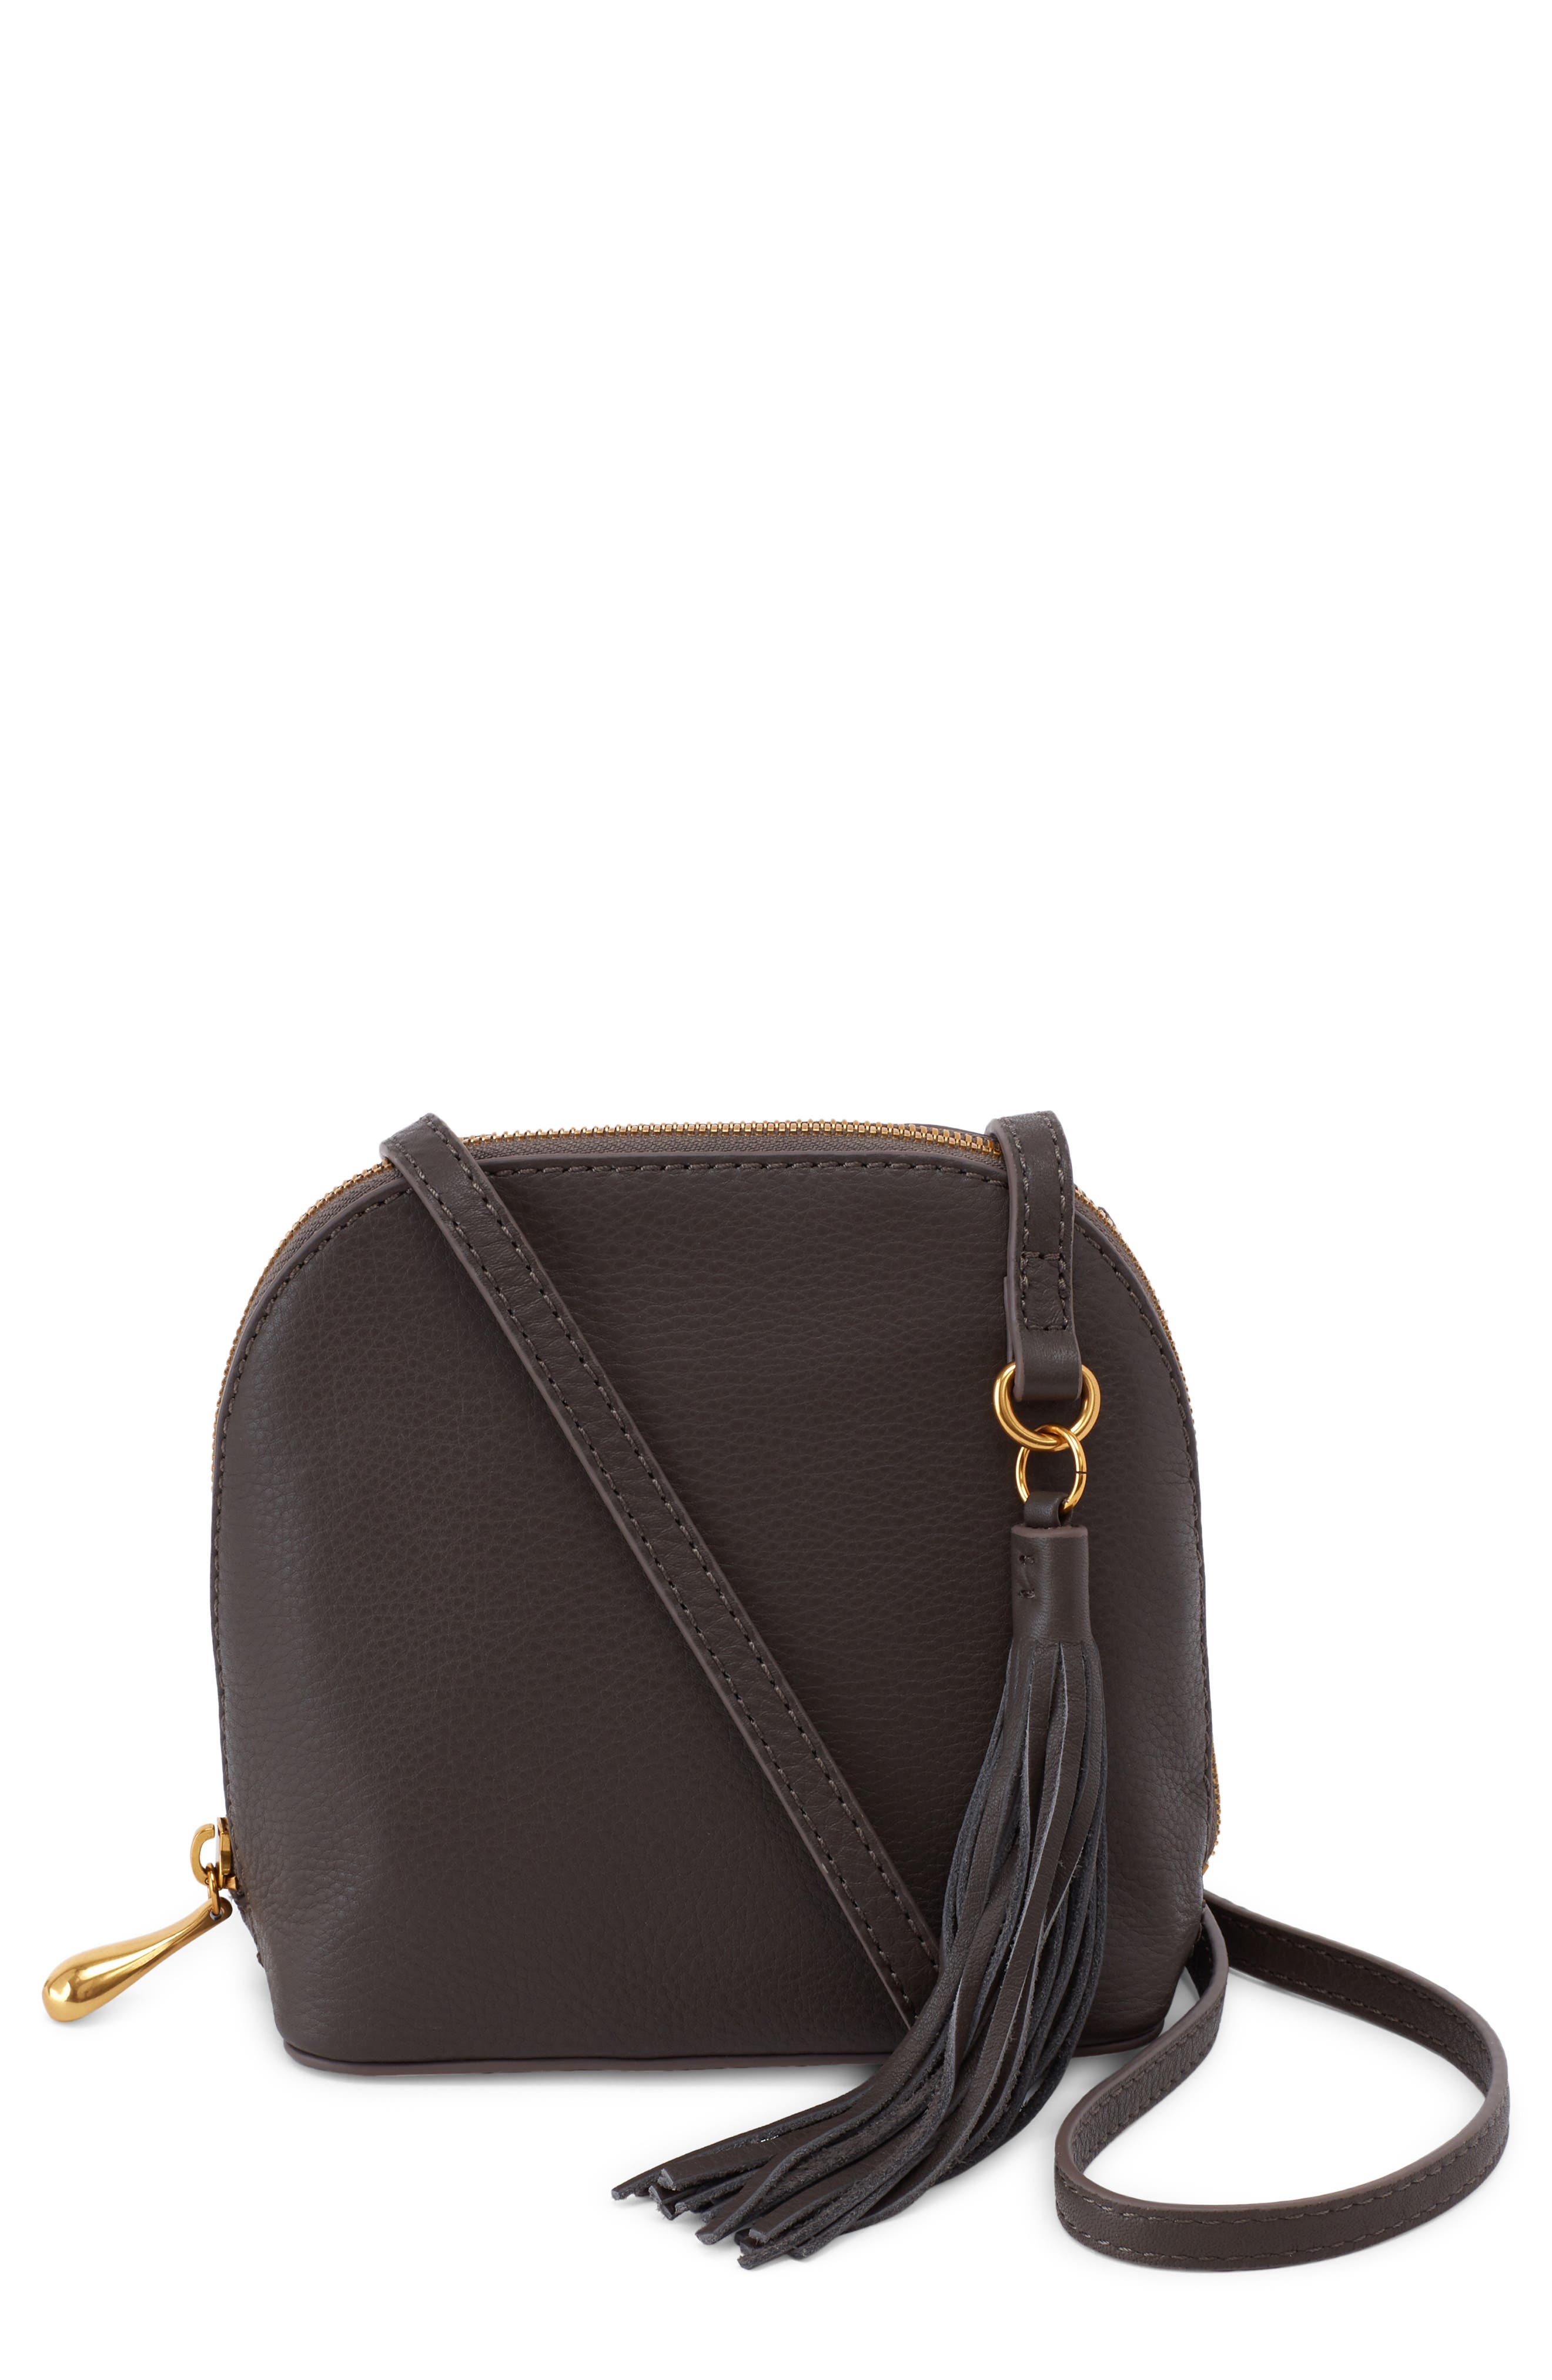 Nash Calfskin Leather Crossbody Bag